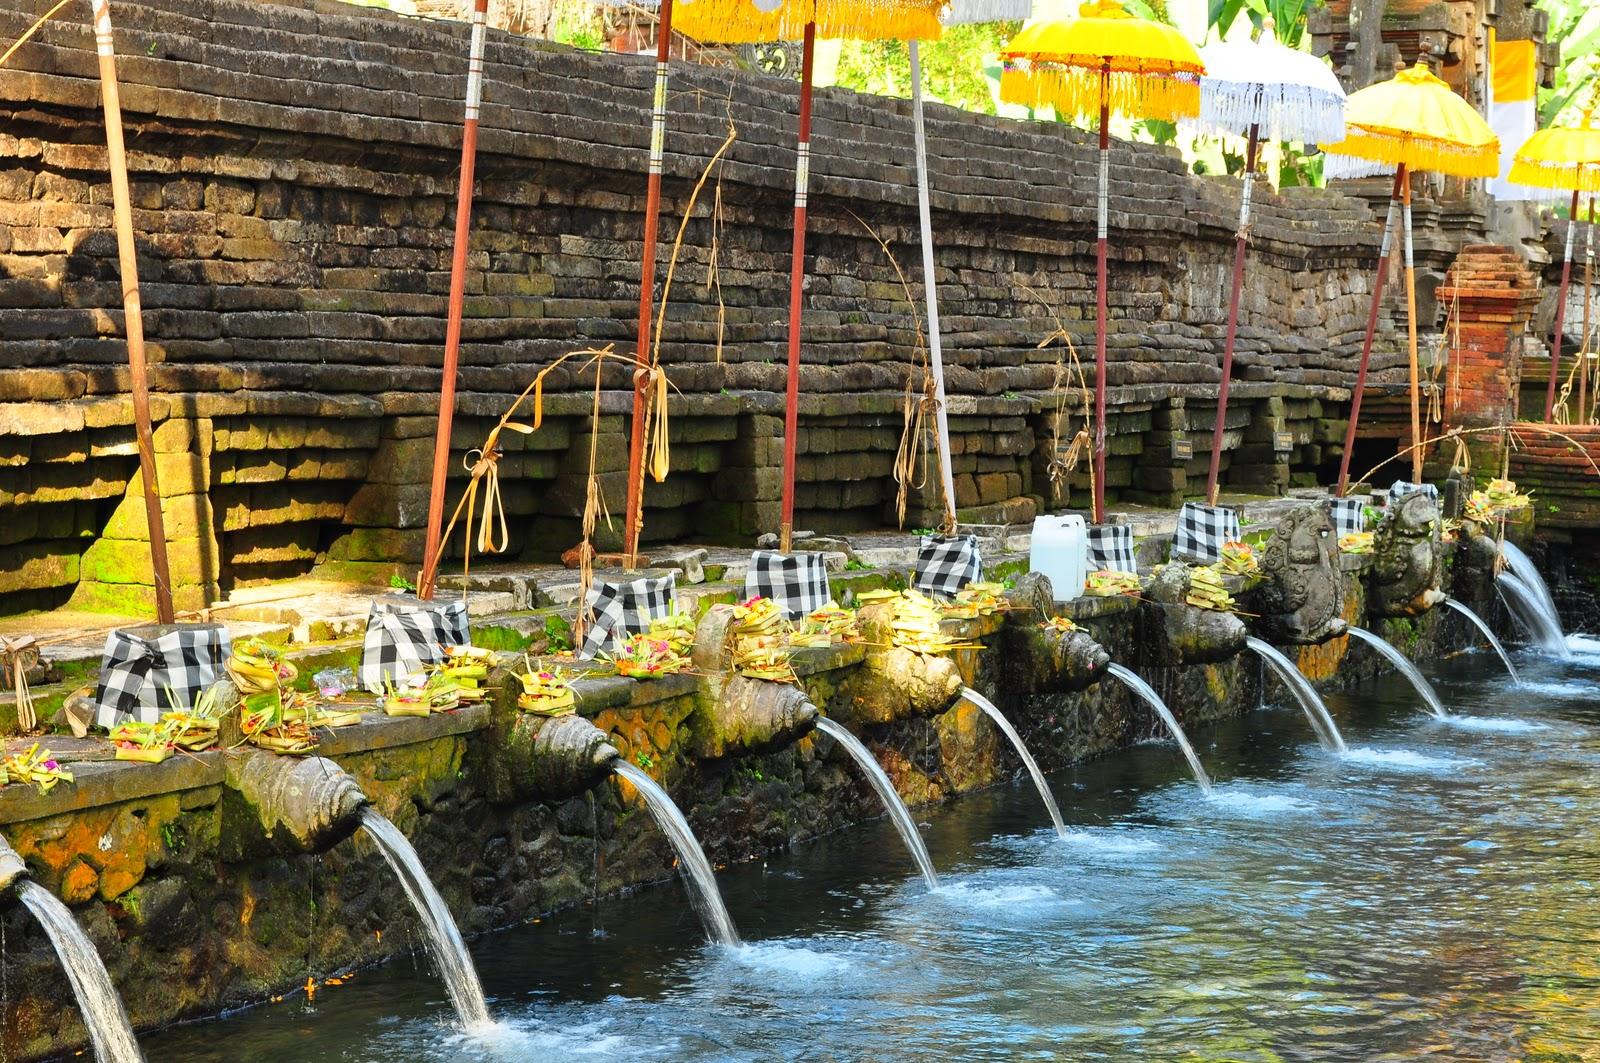 Pura Tirta Empul Tempat Wisata Pemandian Gianyar Bali Kab